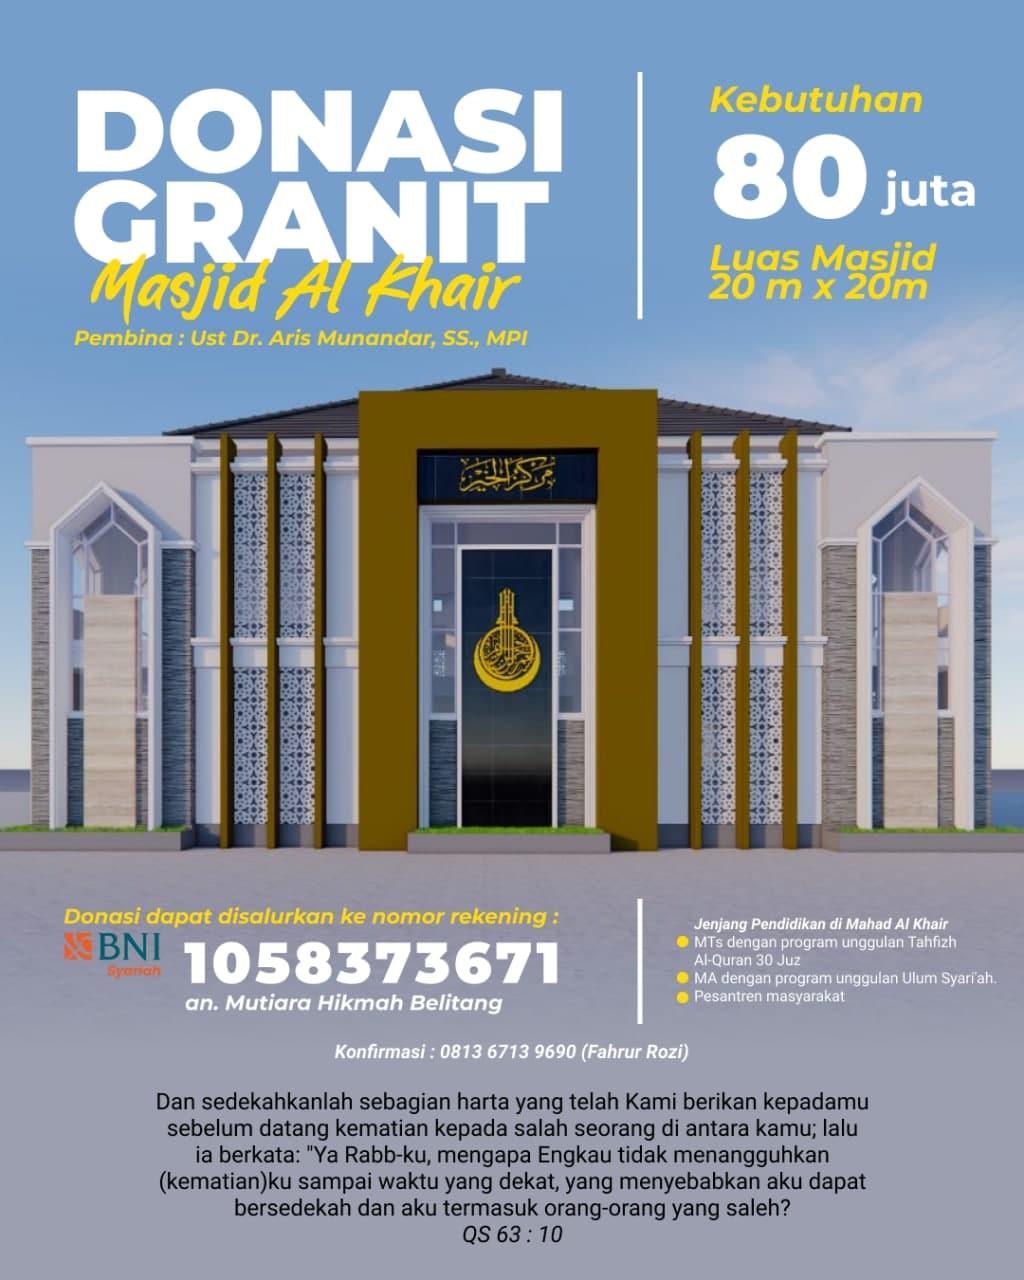 Donasi Granit Masjid Al-Khair OKU Timur